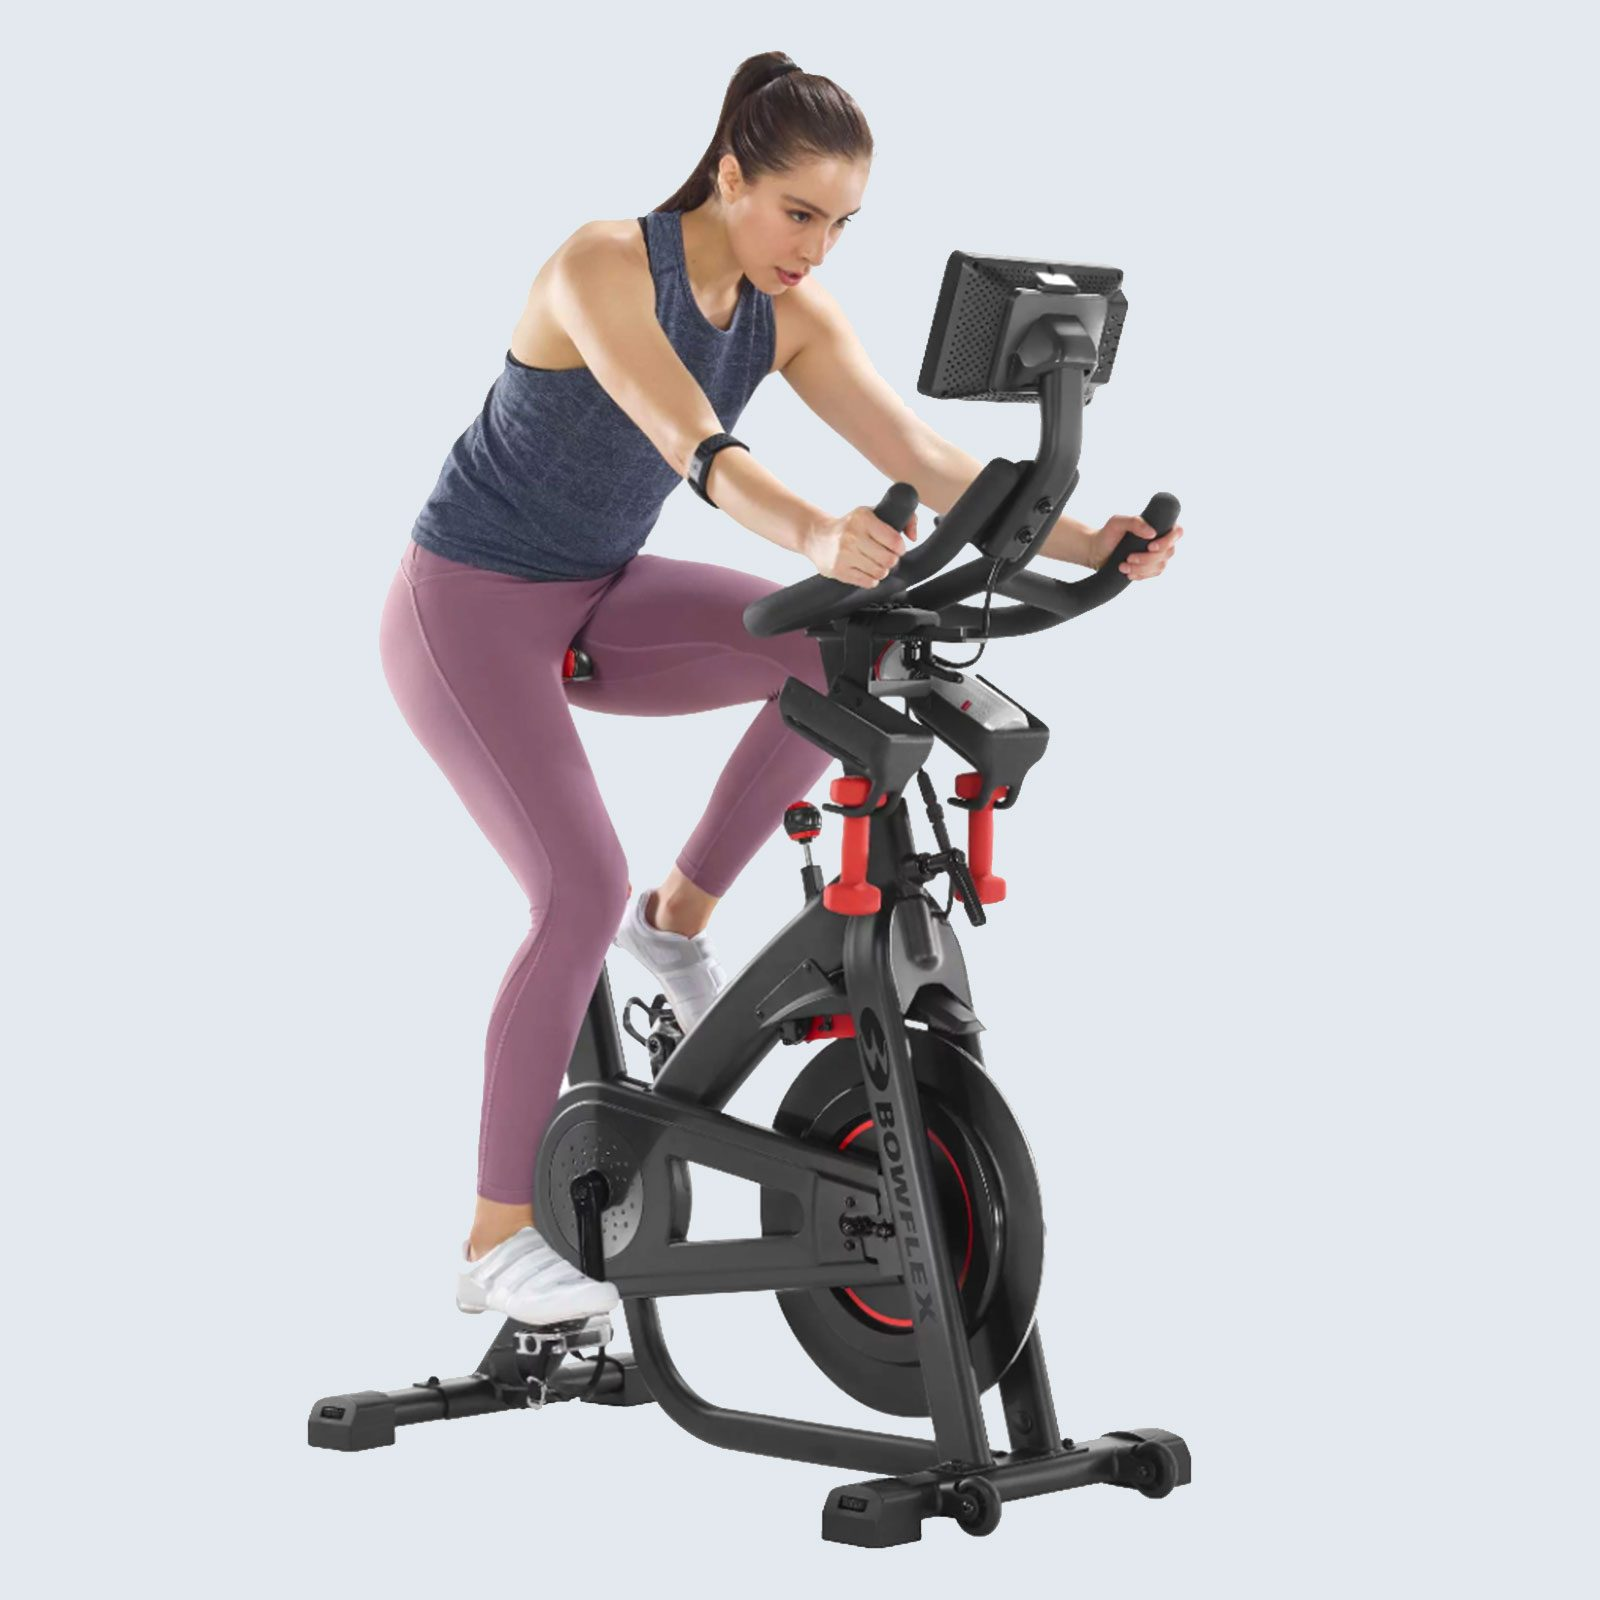 Exercise bikes: Bowflex C7 Indoor Cycling Bike